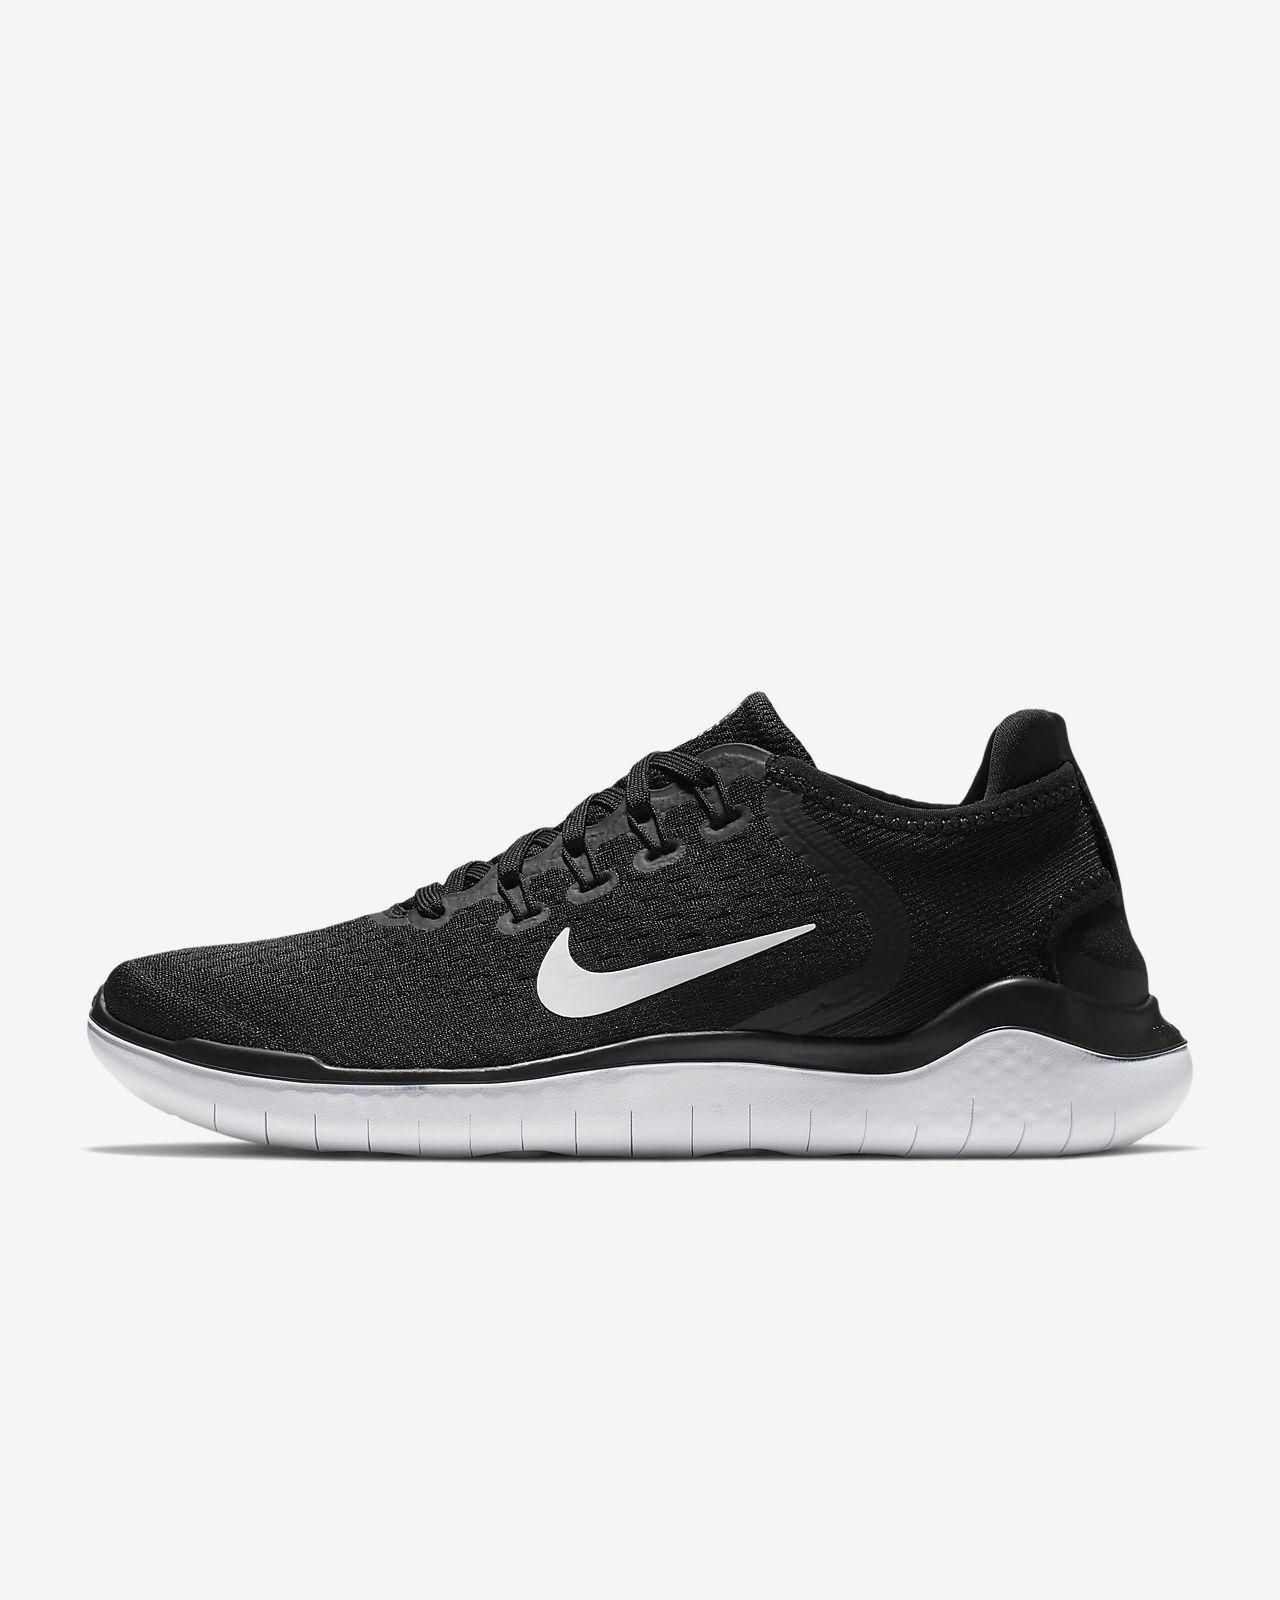 mejores marcas comprar barato llega Calzado de running para mujer Nike Free RN 2018